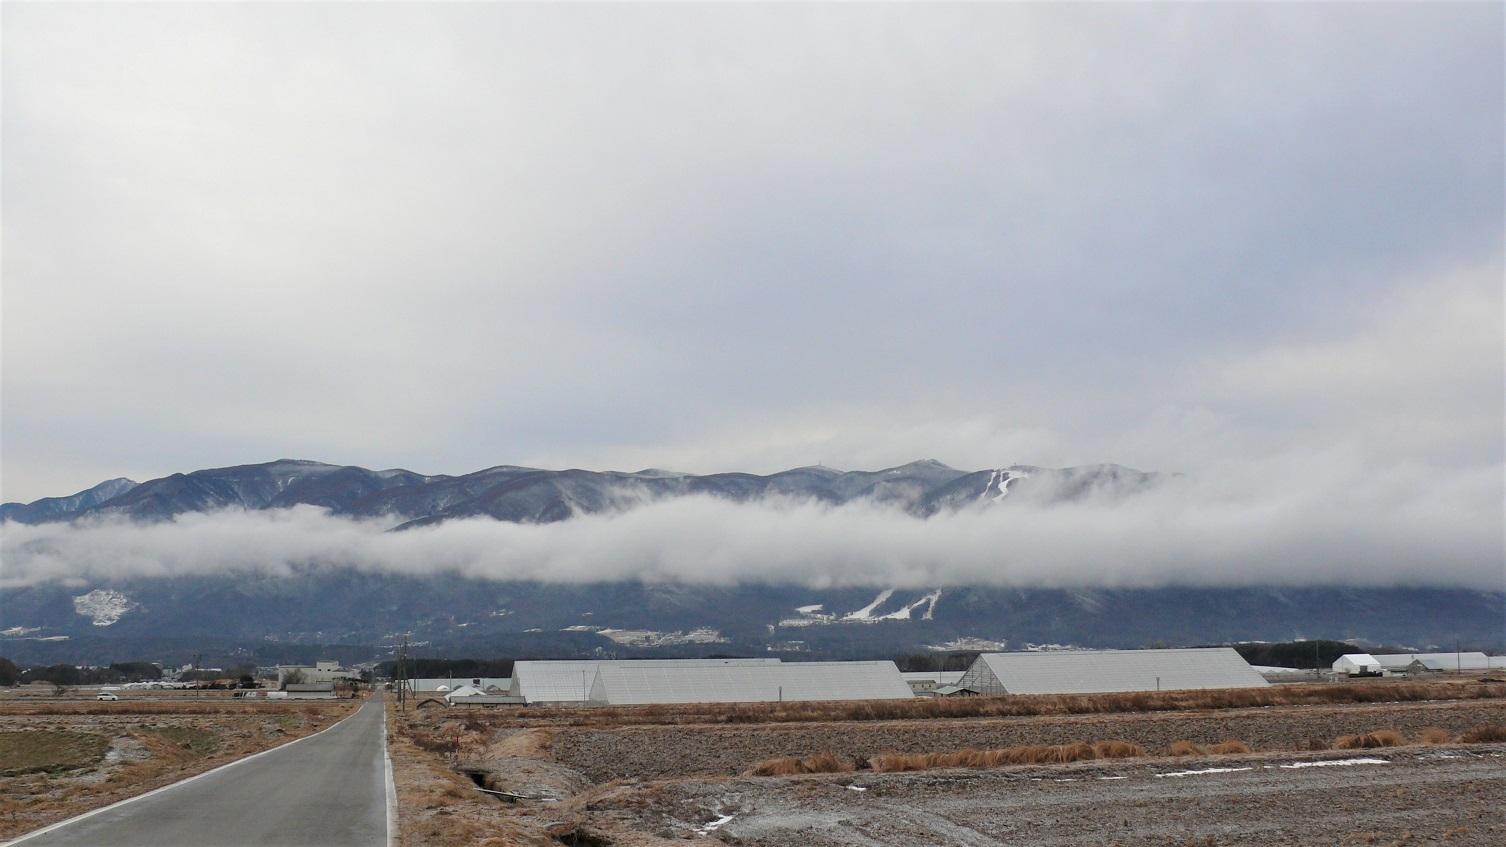 http://www.alpico.co.jp/shikinomori/news/images/P1070917.JPG